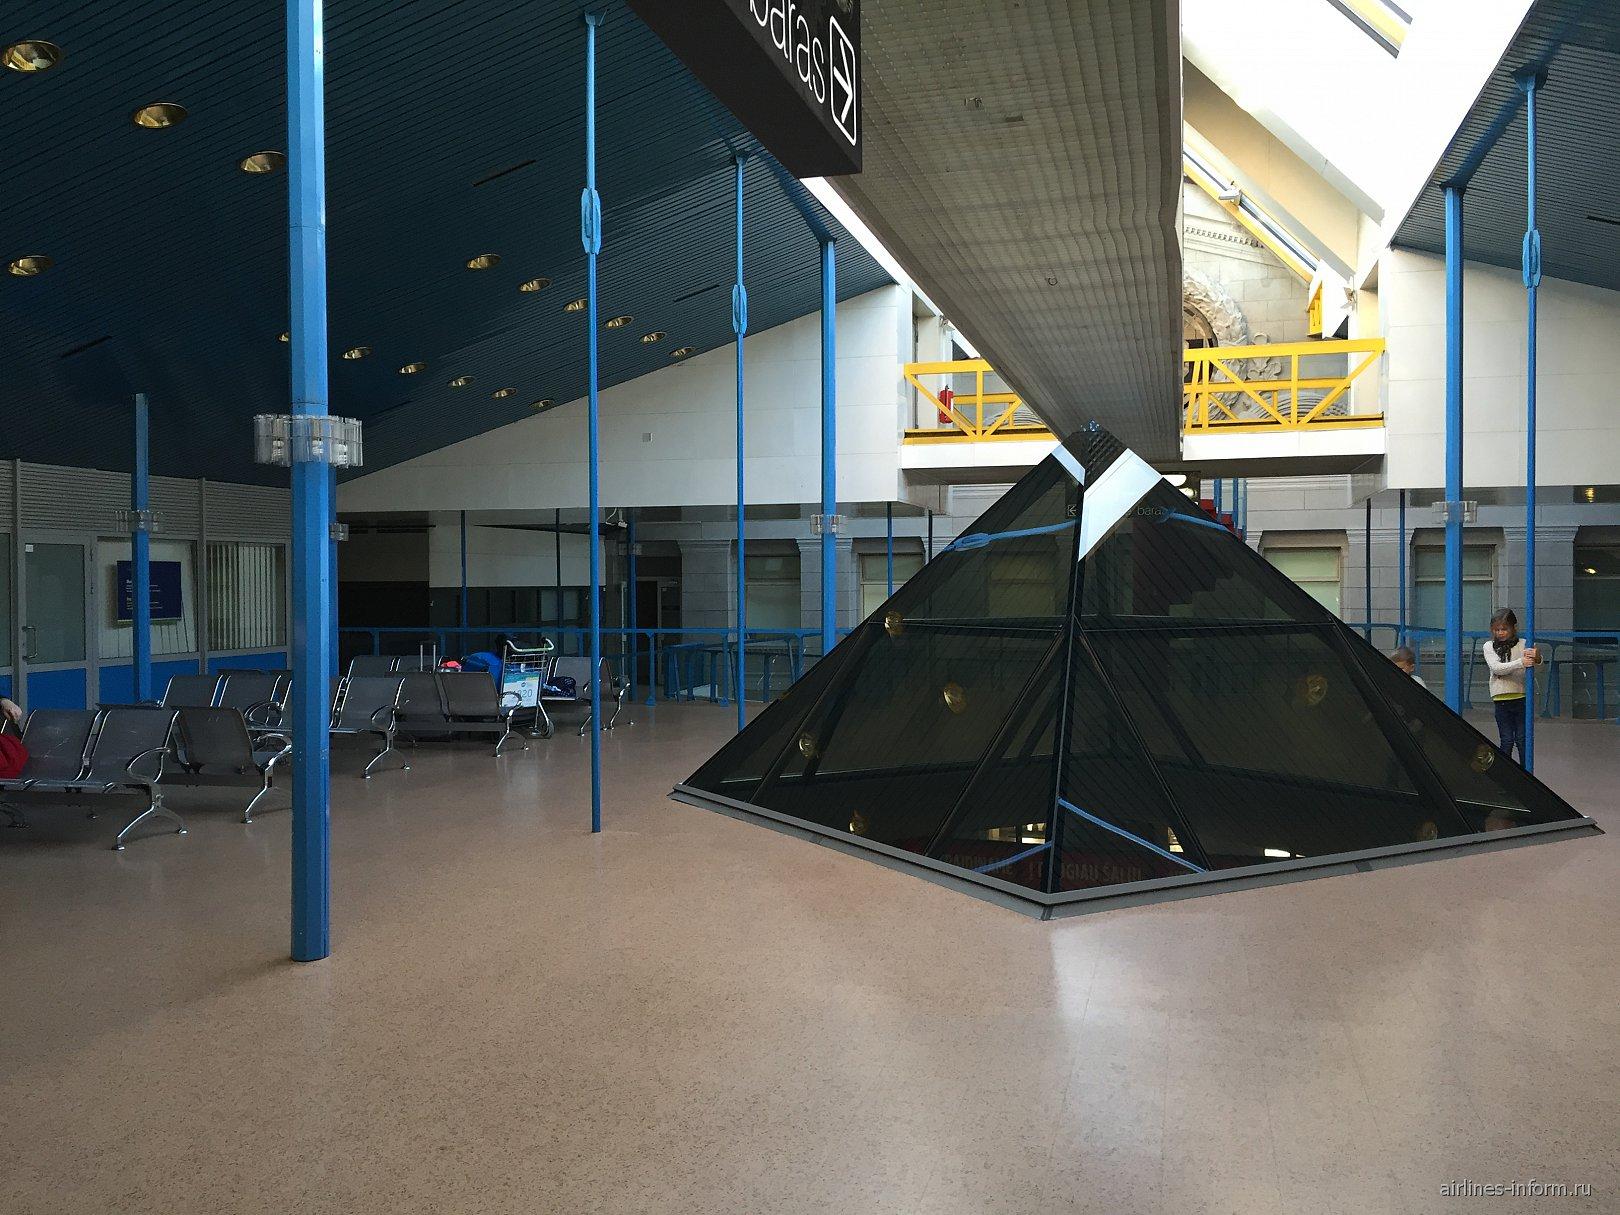 Зал ожидания на 2-м этаже аэропорта Вильнюс